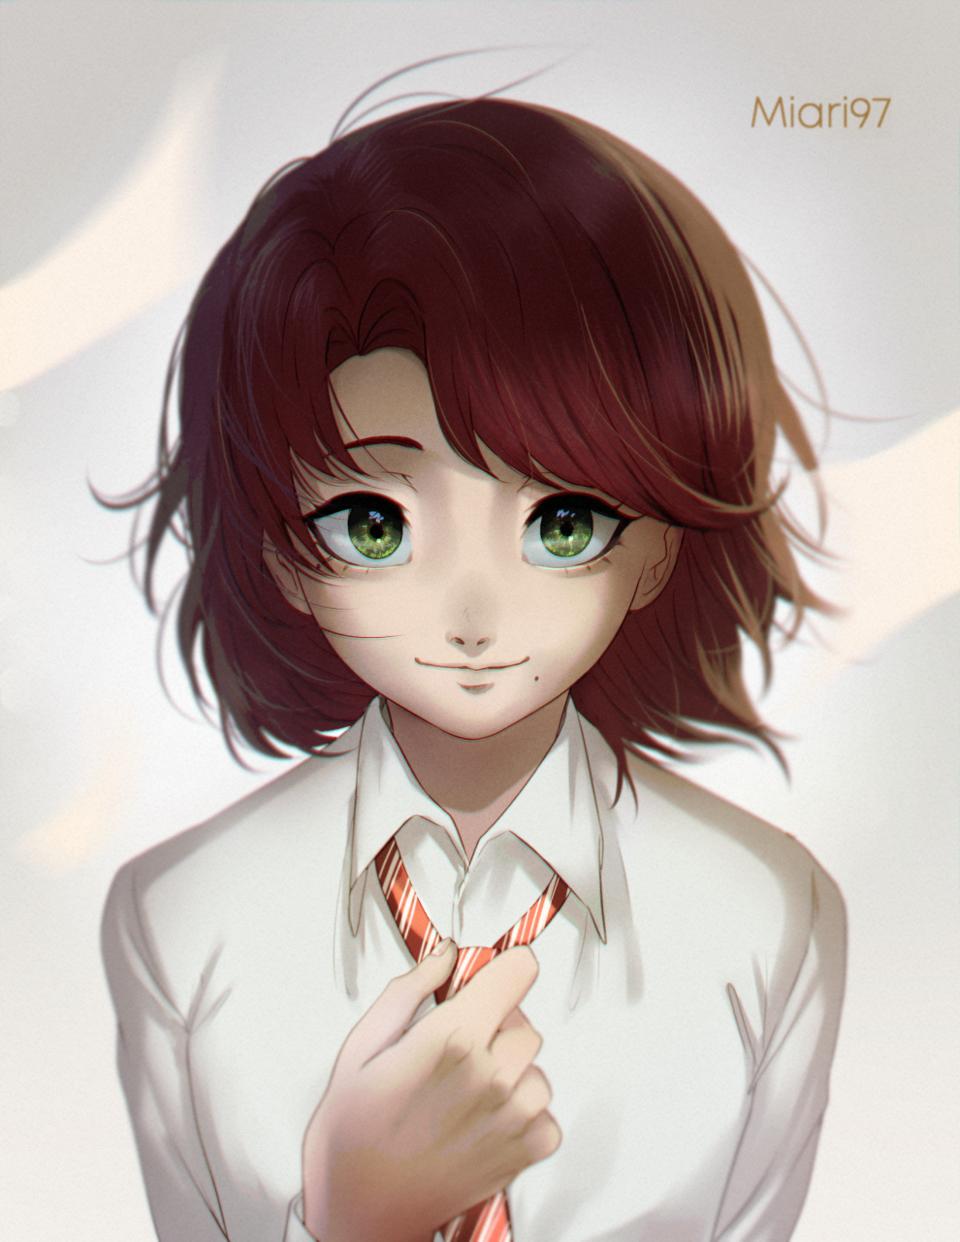 Kage (Subscriber's OC) Illust of Miari97 art sixFanartschallenge drawing boy greeneyes anime illustration redhair digital cute